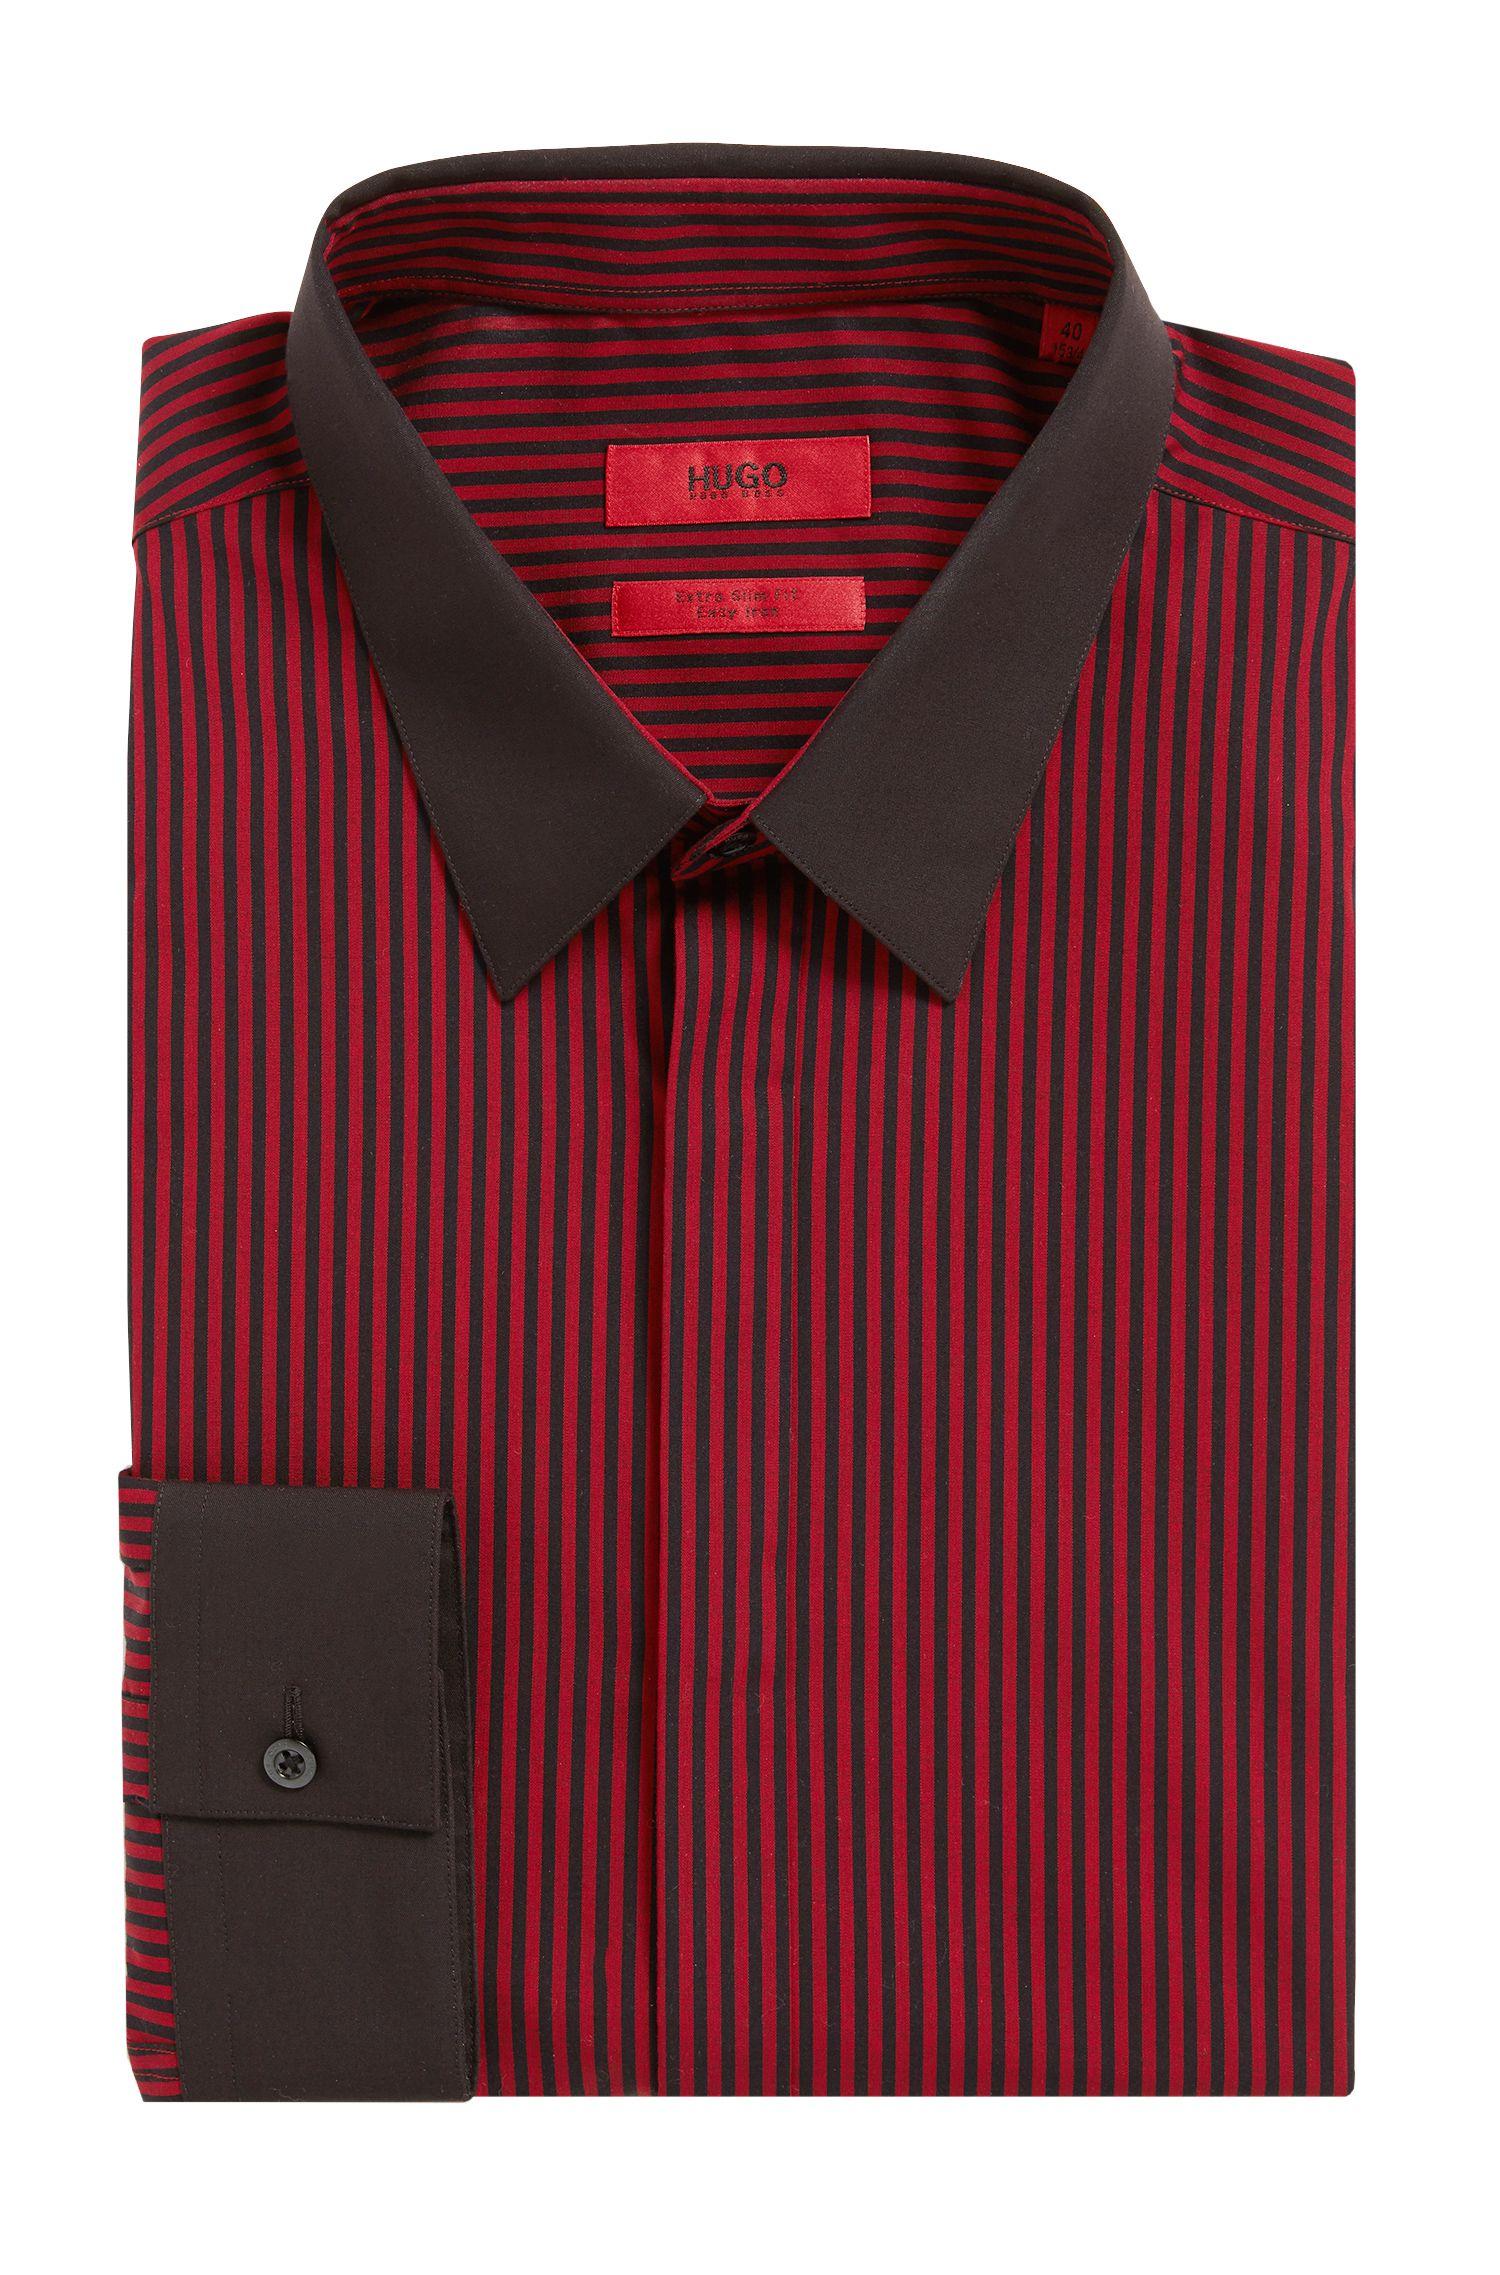 'Elynon' | Extra-Slim Fit, Striped Easy Iron Cotton Dress Shirt